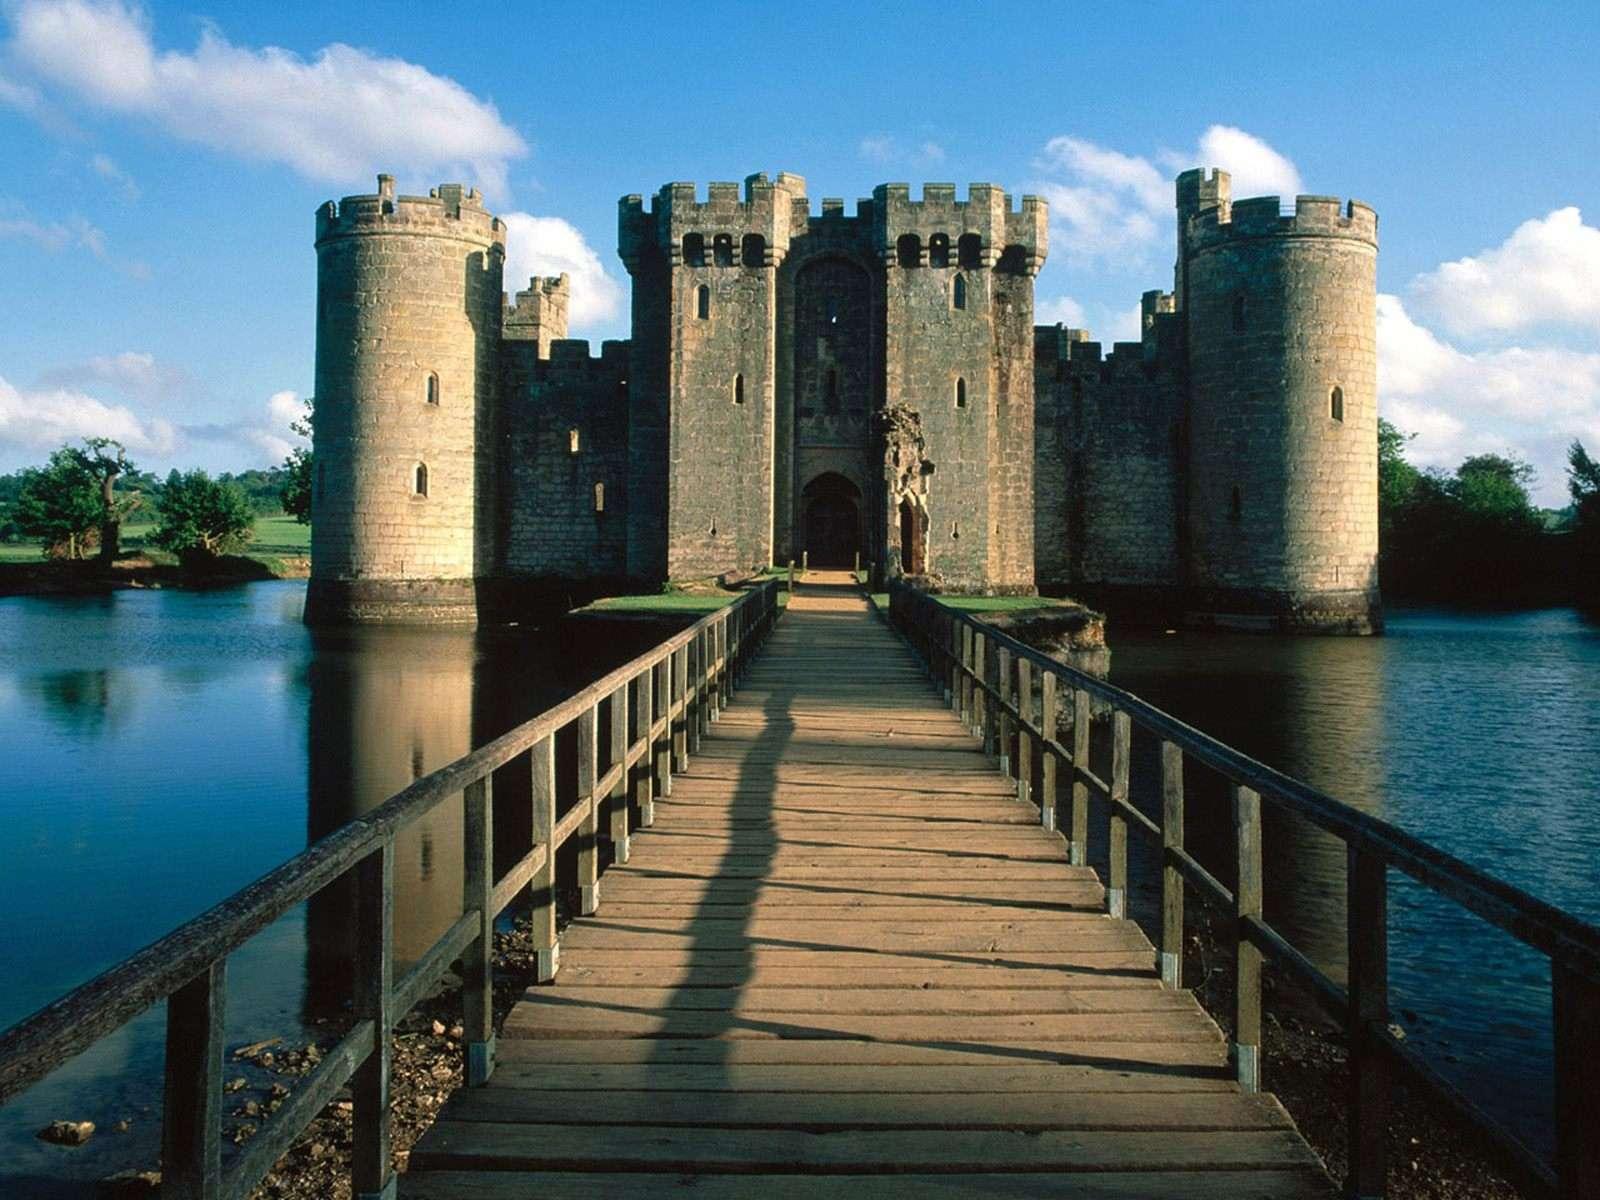 Castle Wallpaper 001